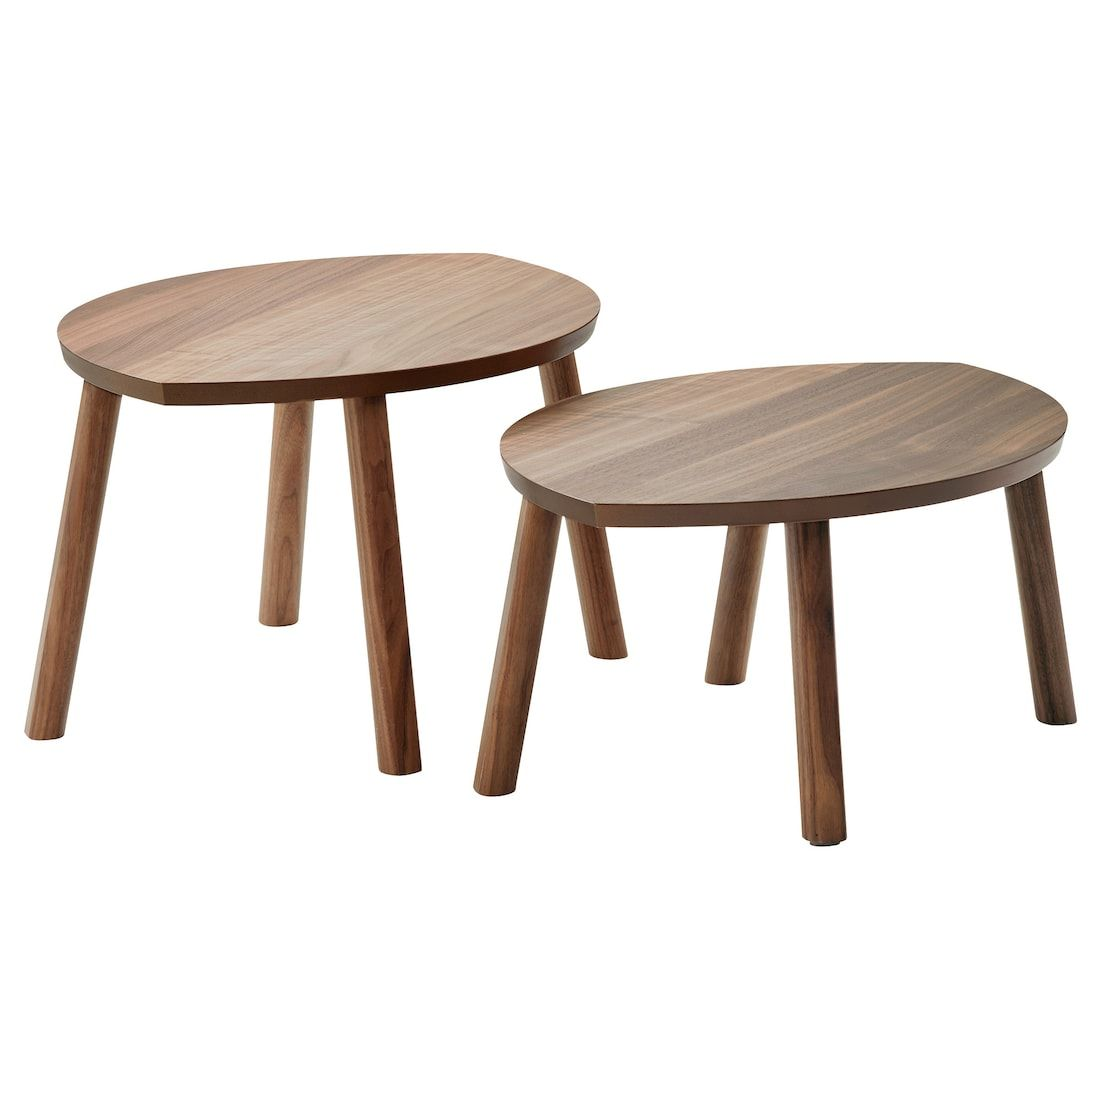 Stockholm Nesting Tables Set Of 2 Walnut Veneer Ikea In 2021 Ikea Coffee Table Ikea Stockholm Nesting Tables [ 1100 x 1100 Pixel ]